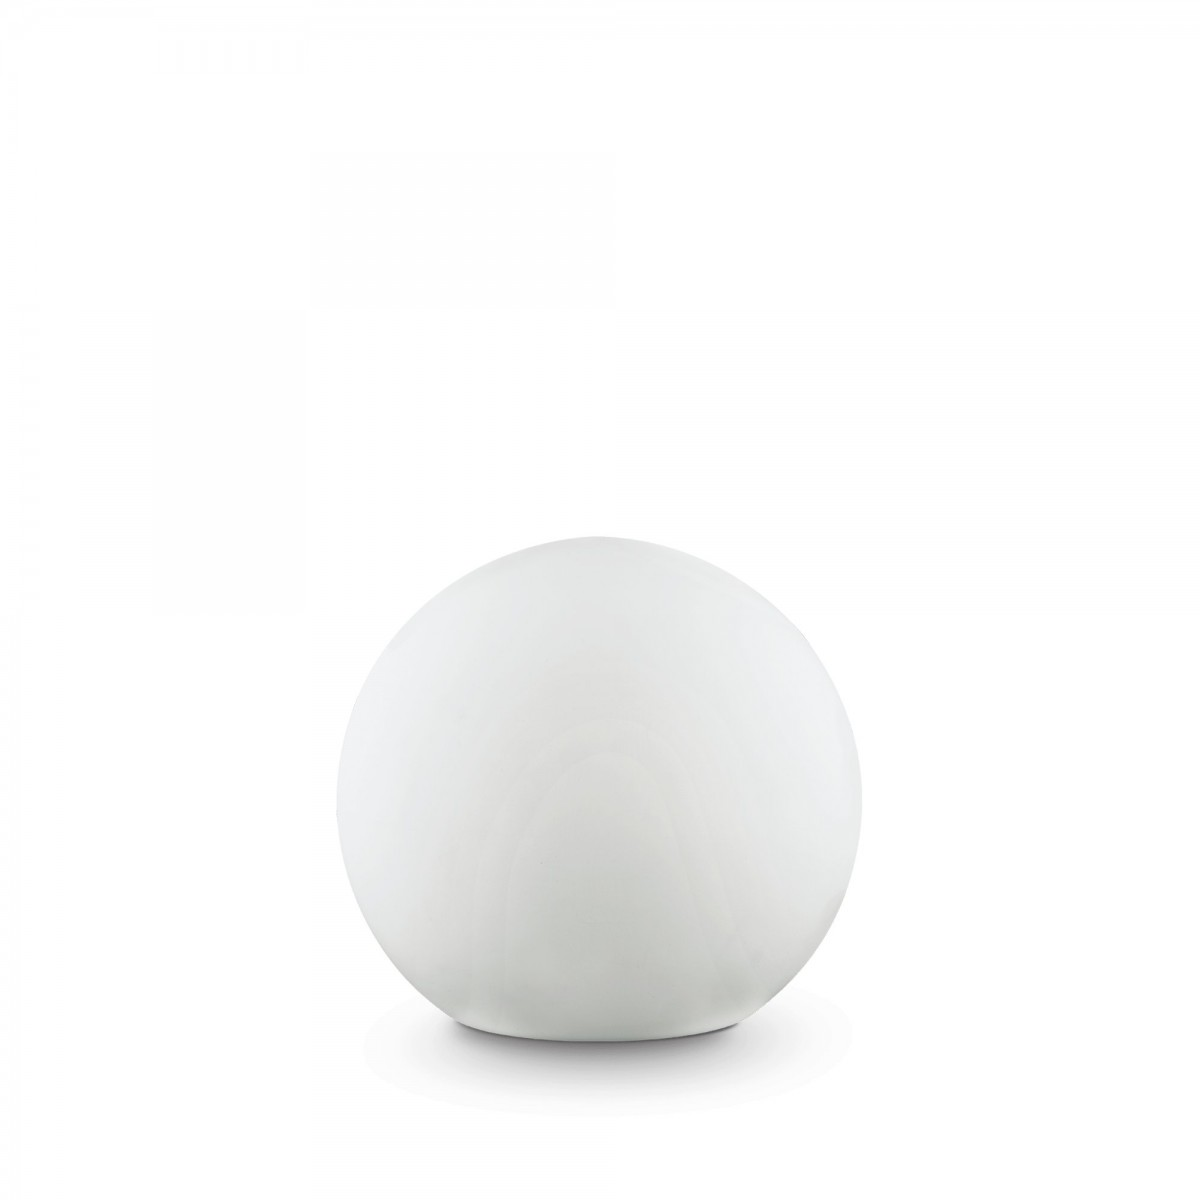 Ideal Lux 191638 venkovní lampa Sole Small 1x60W|E27|IP44 - bílá